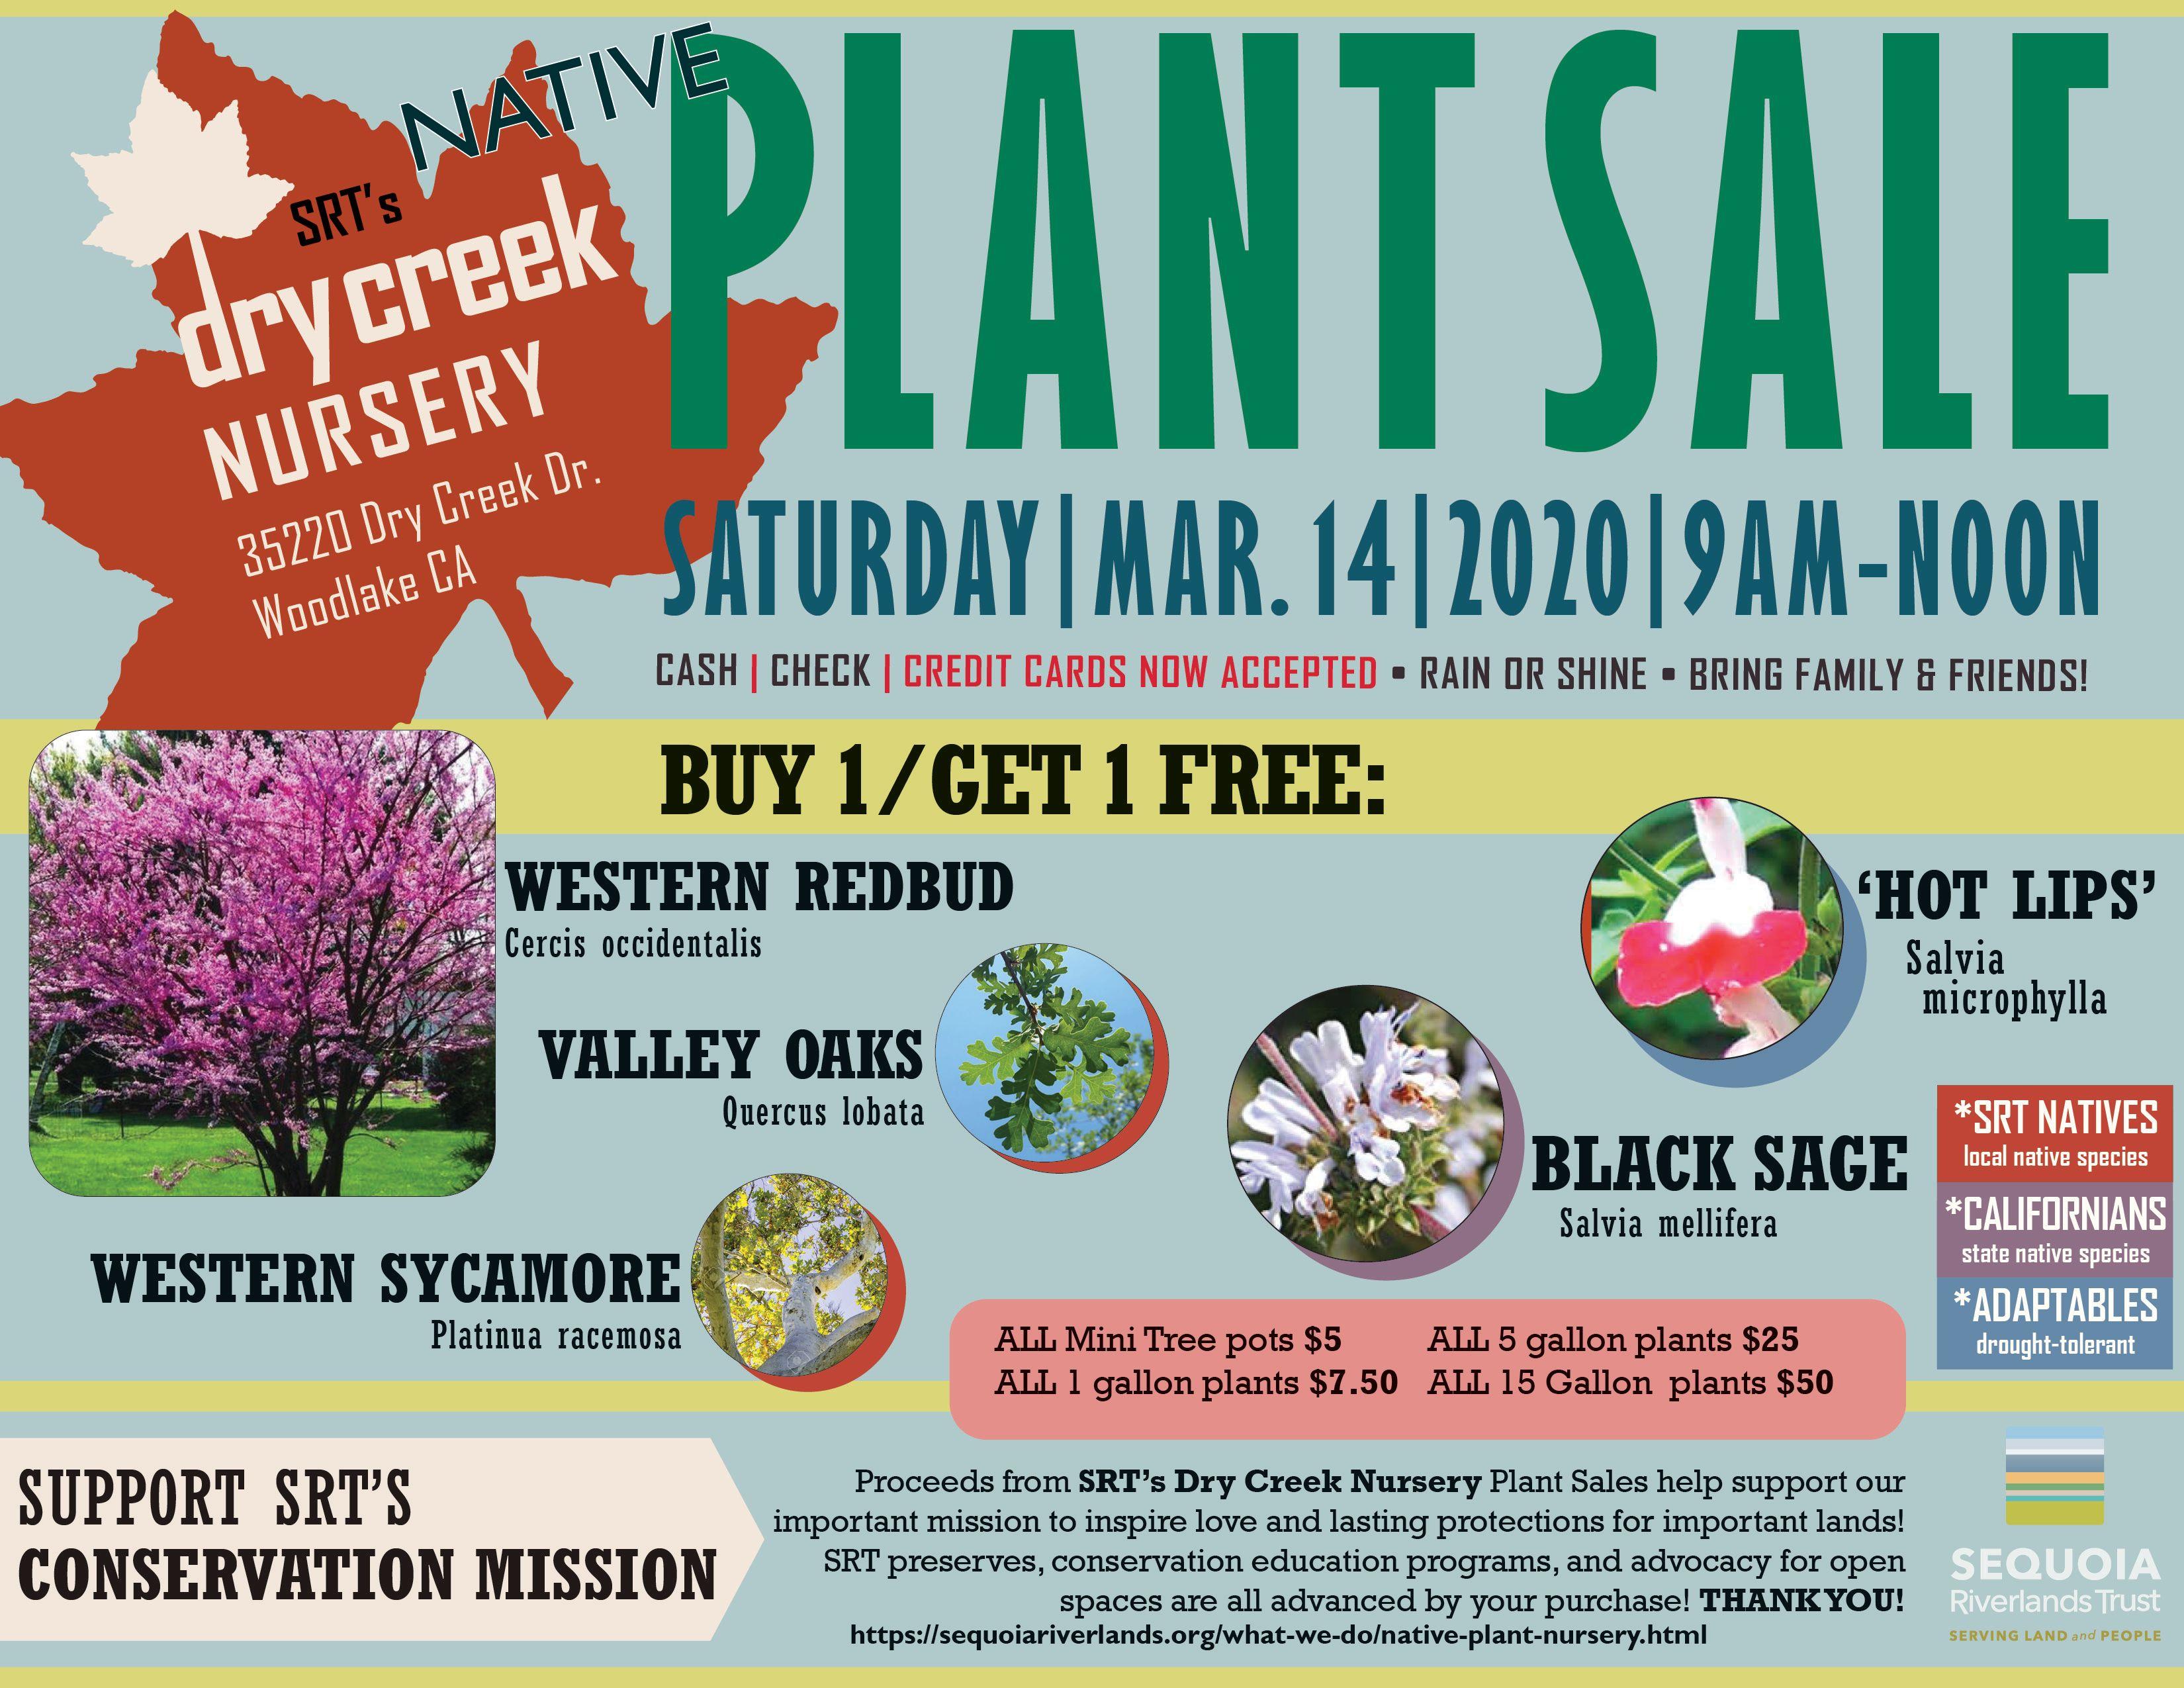 BIG Native Plant Sale returns to SRT Dry Creek Nursery this Saturday!